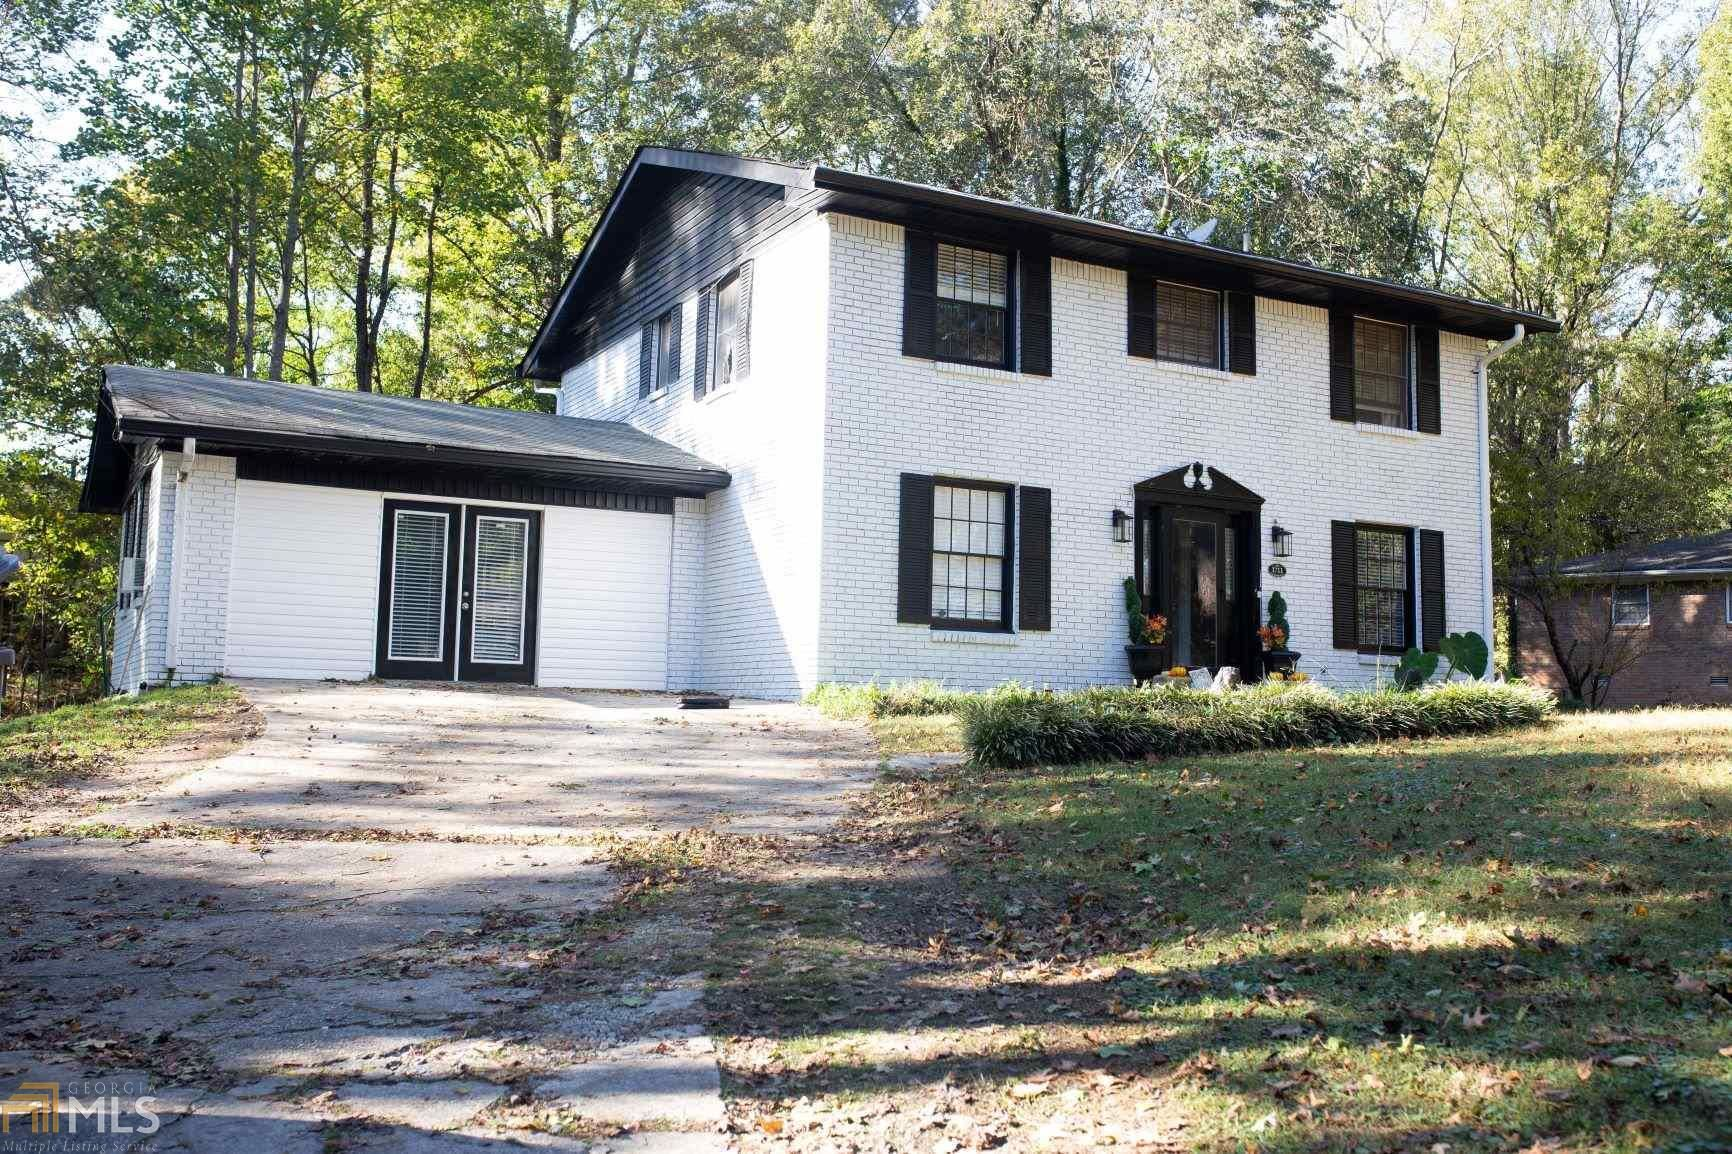 1711 E Kellogg, Douglasville, GA 30134 - MLS#: 8882433